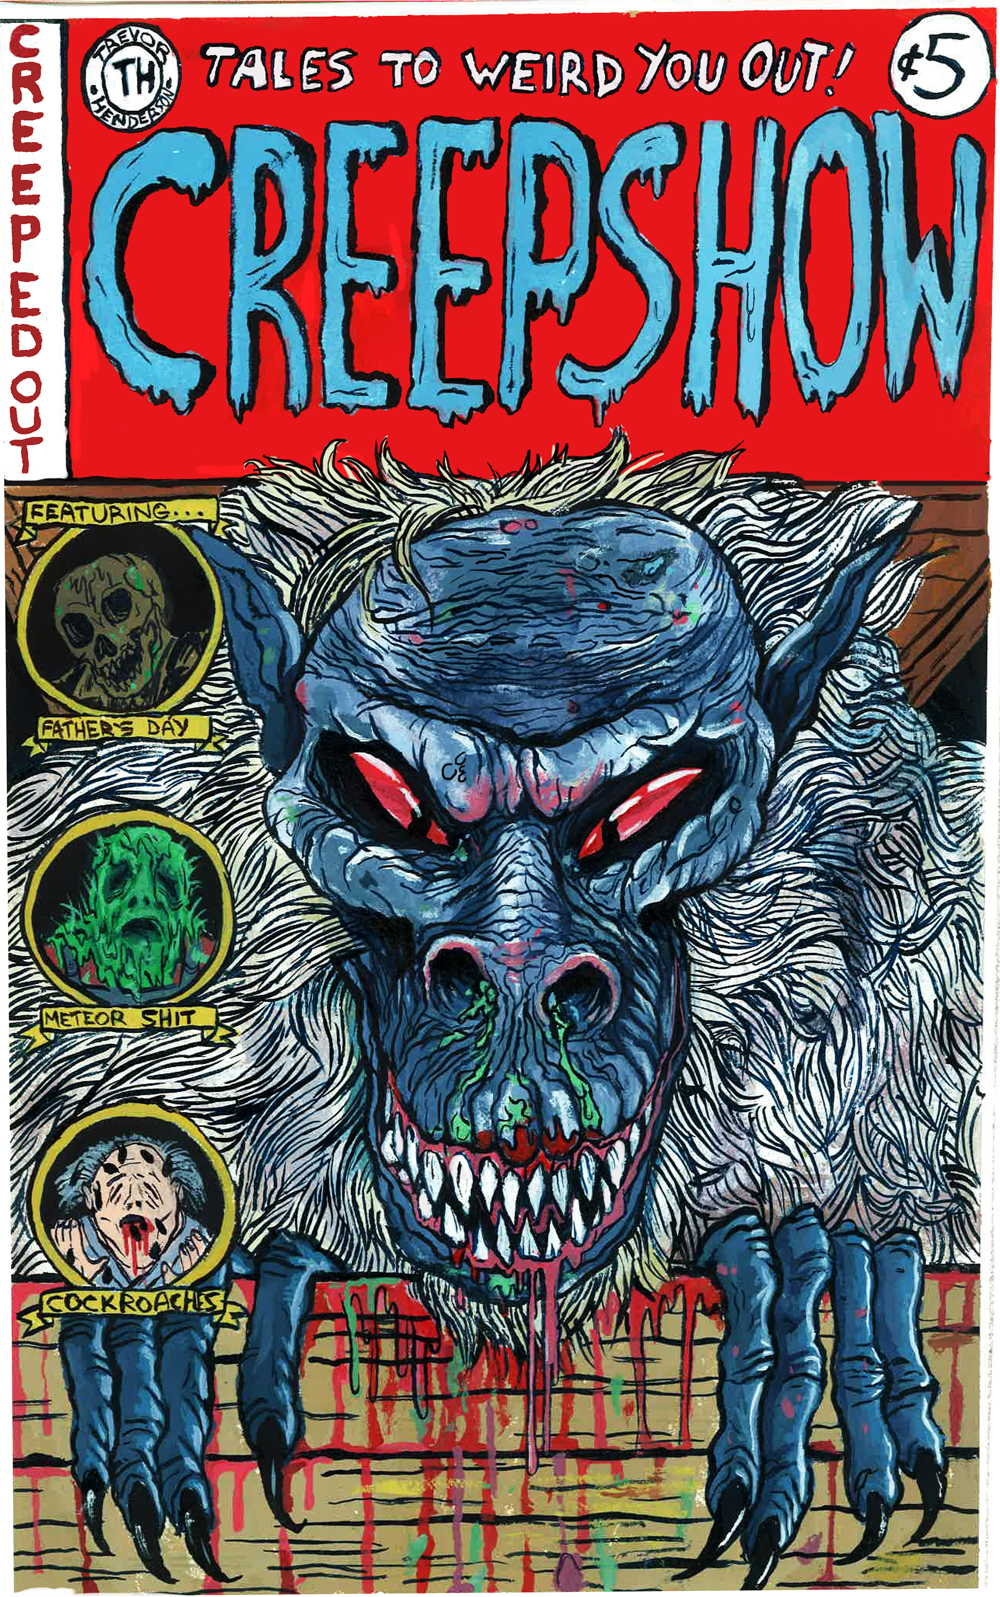 Trevor Henderson - Creepshow